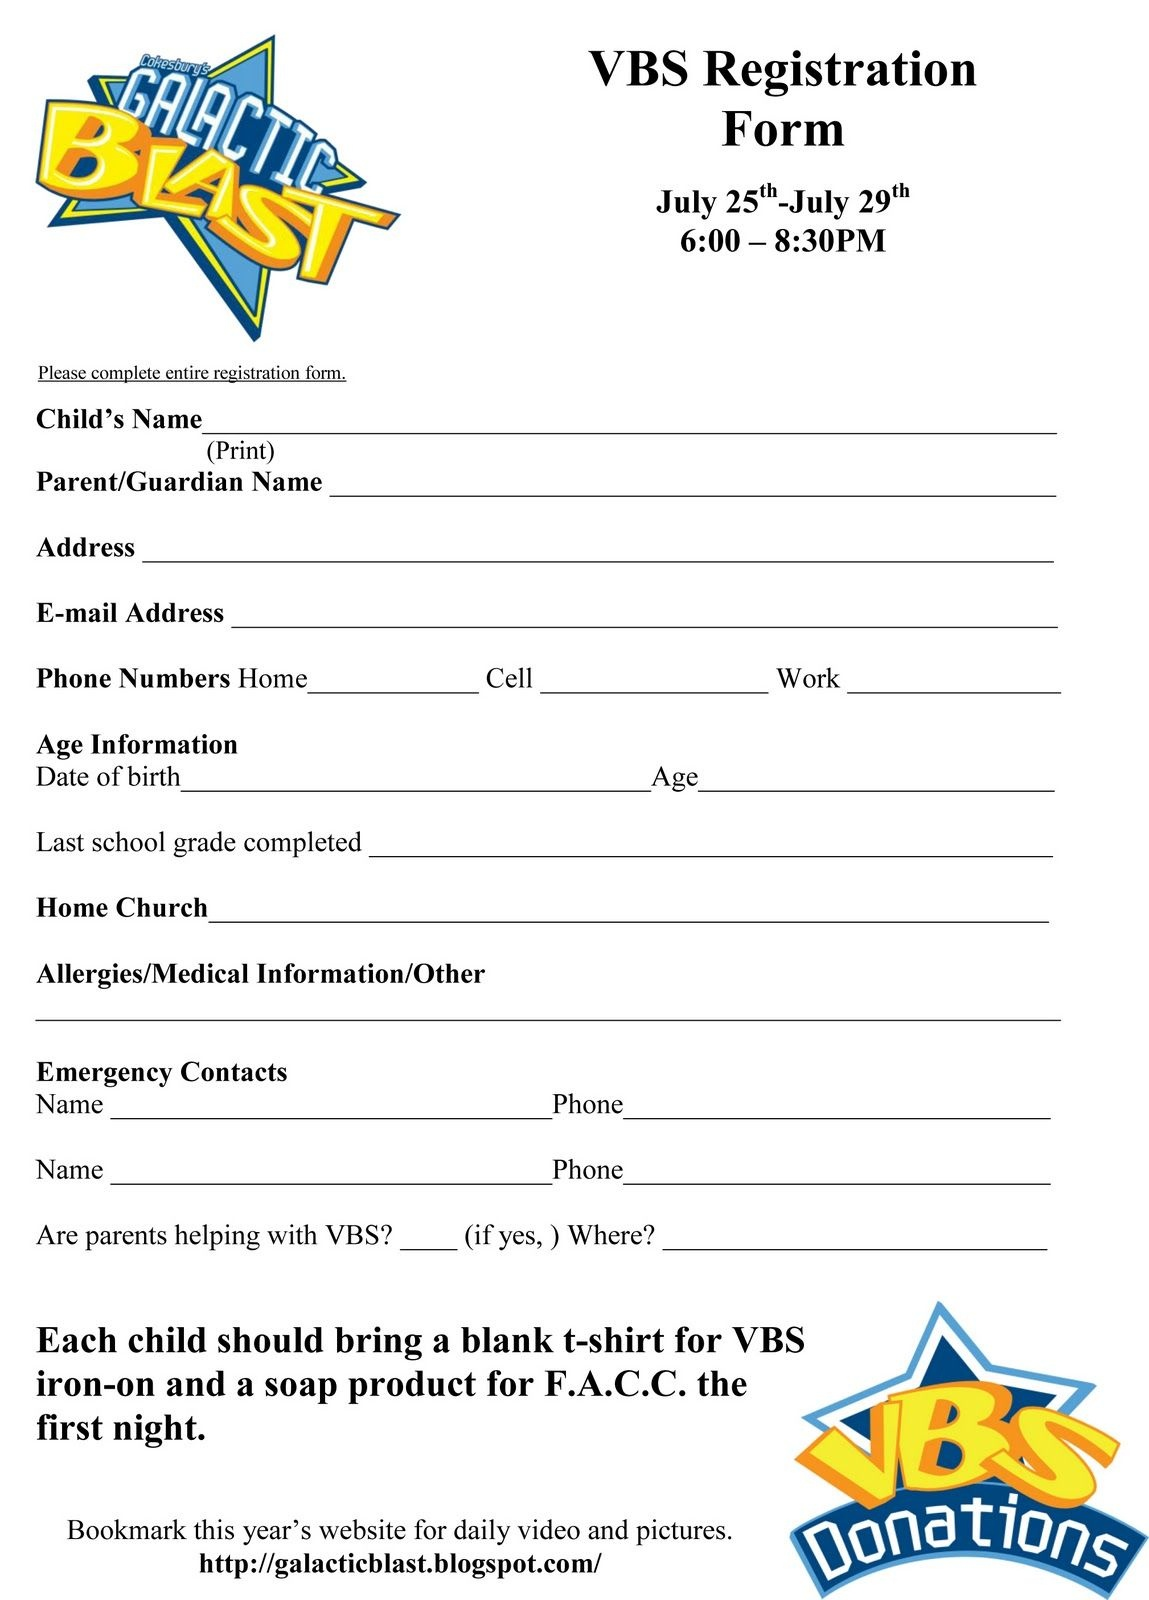 Free Vbs Registration Form Template | Vbs | Resume Template Free - Free Printable Vbs Registration Forms